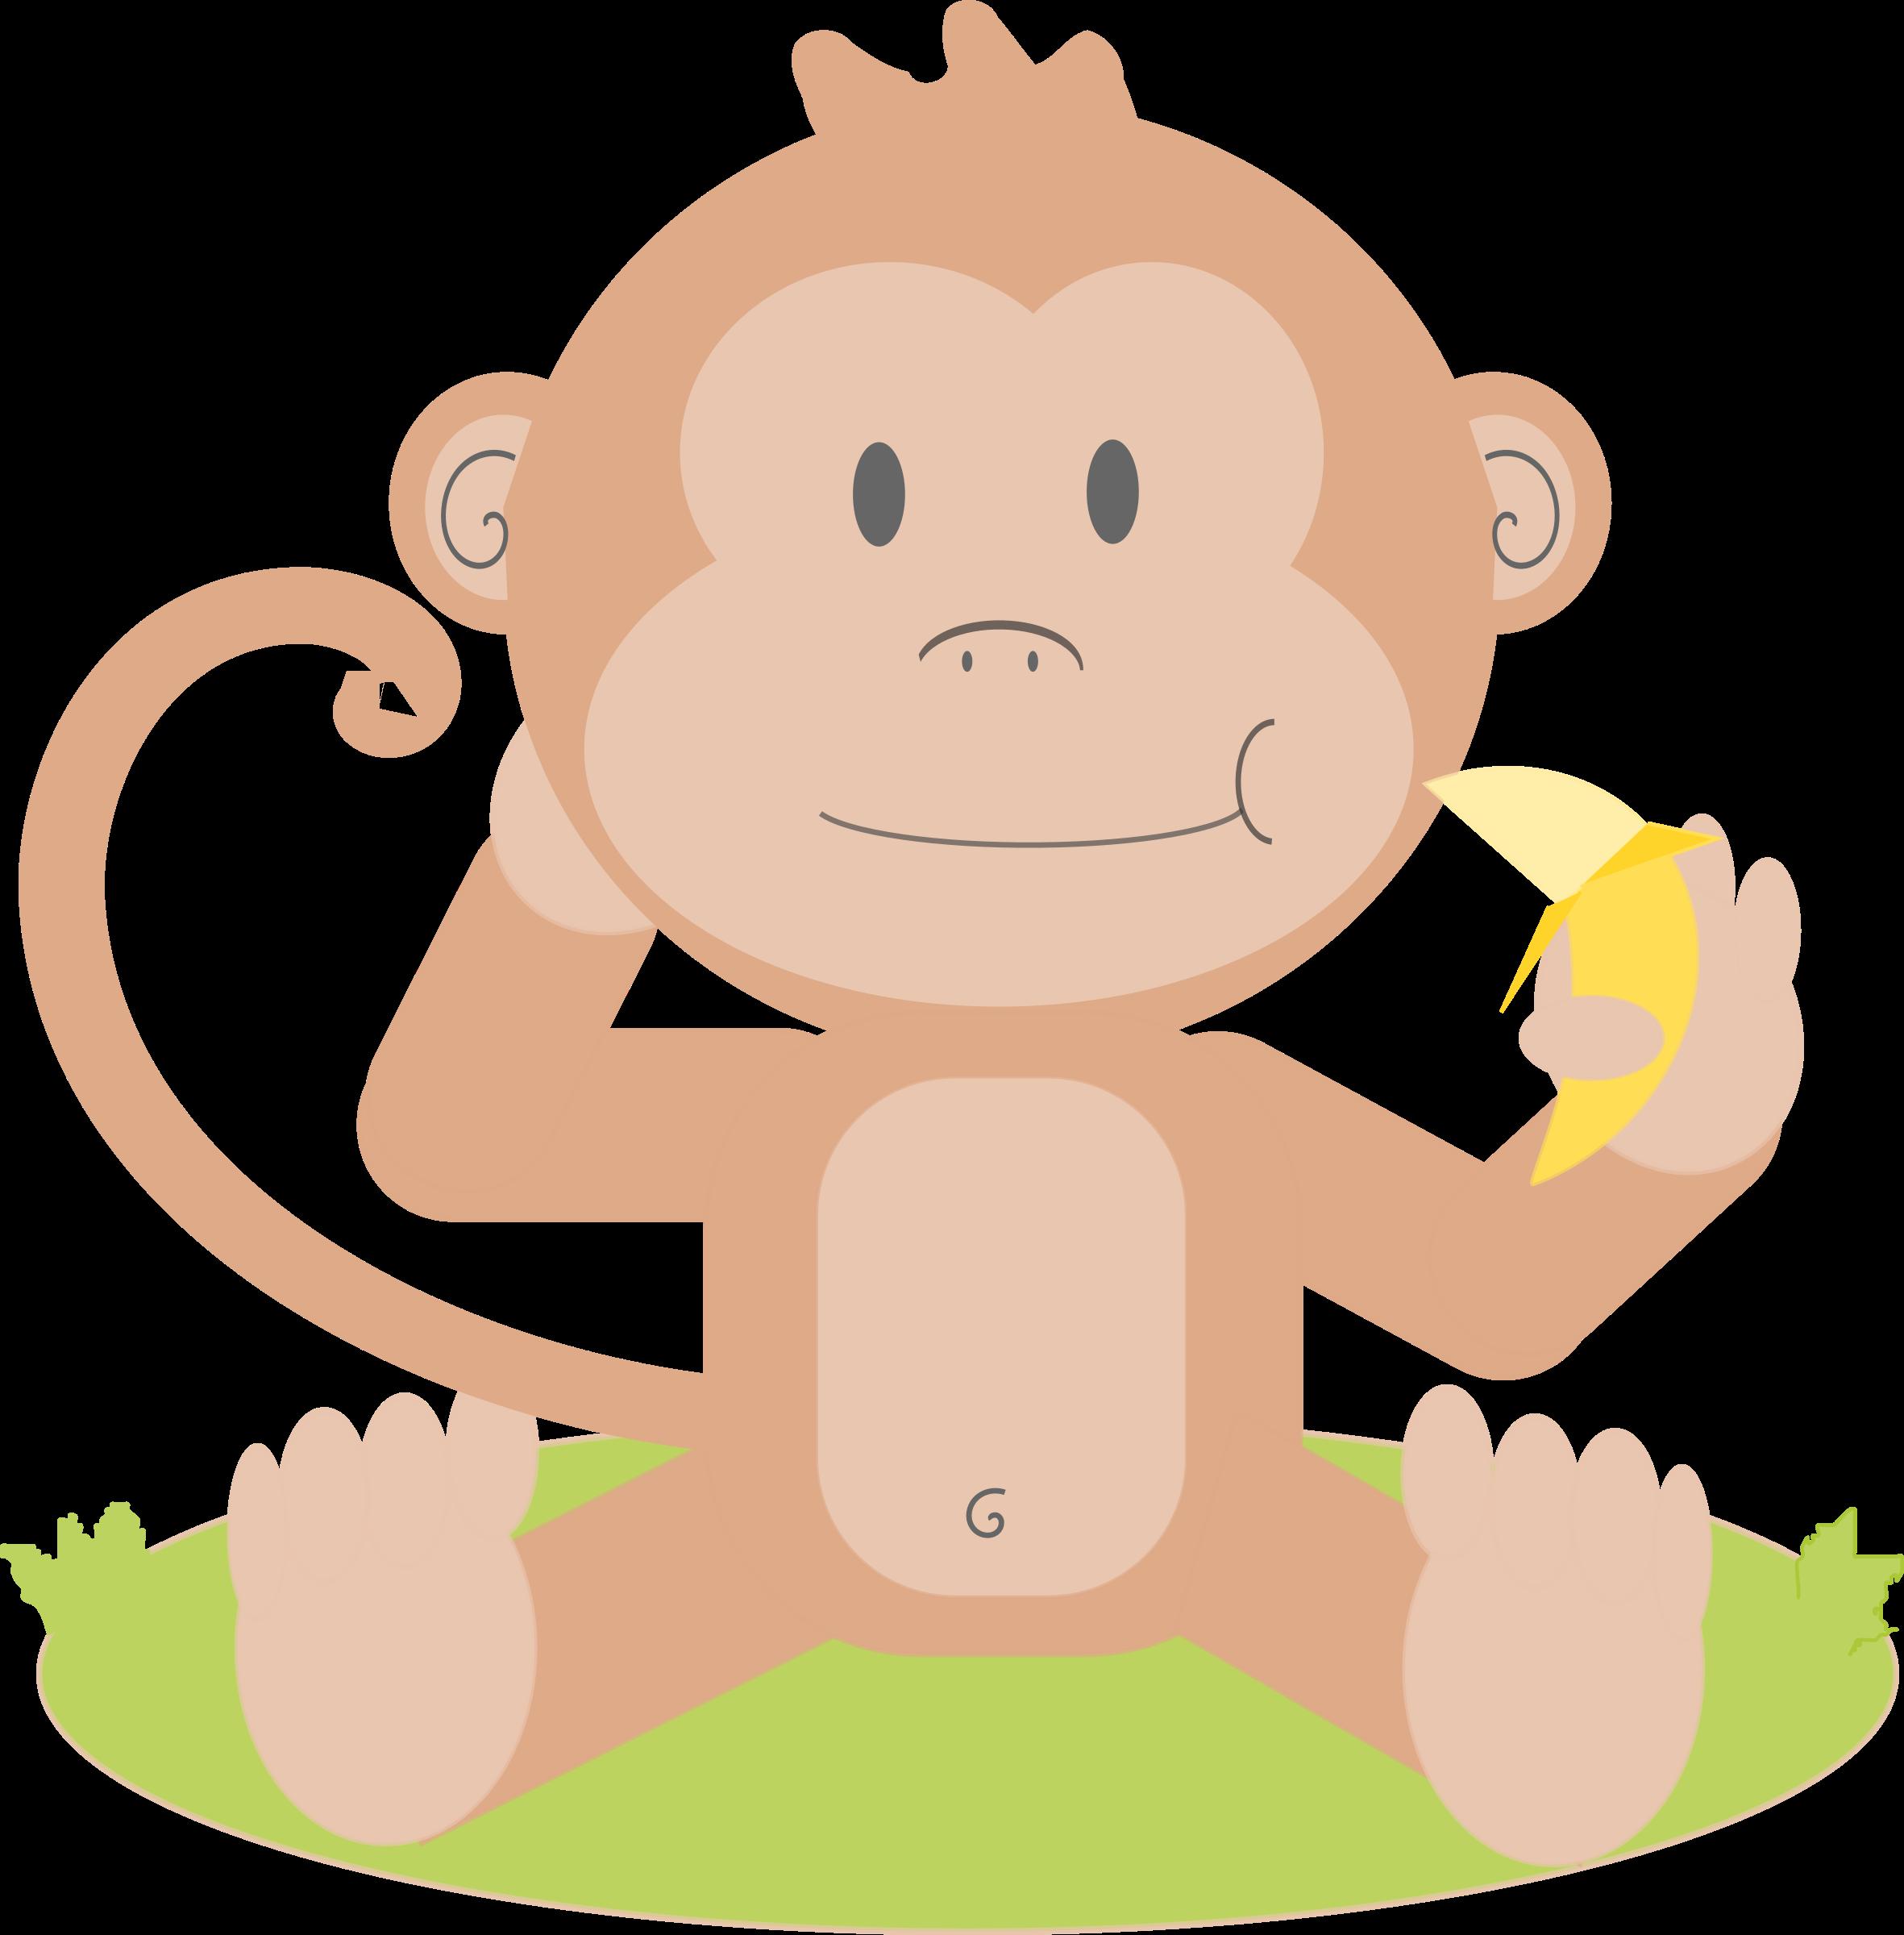 Circus clipart monkey. Cartoon group